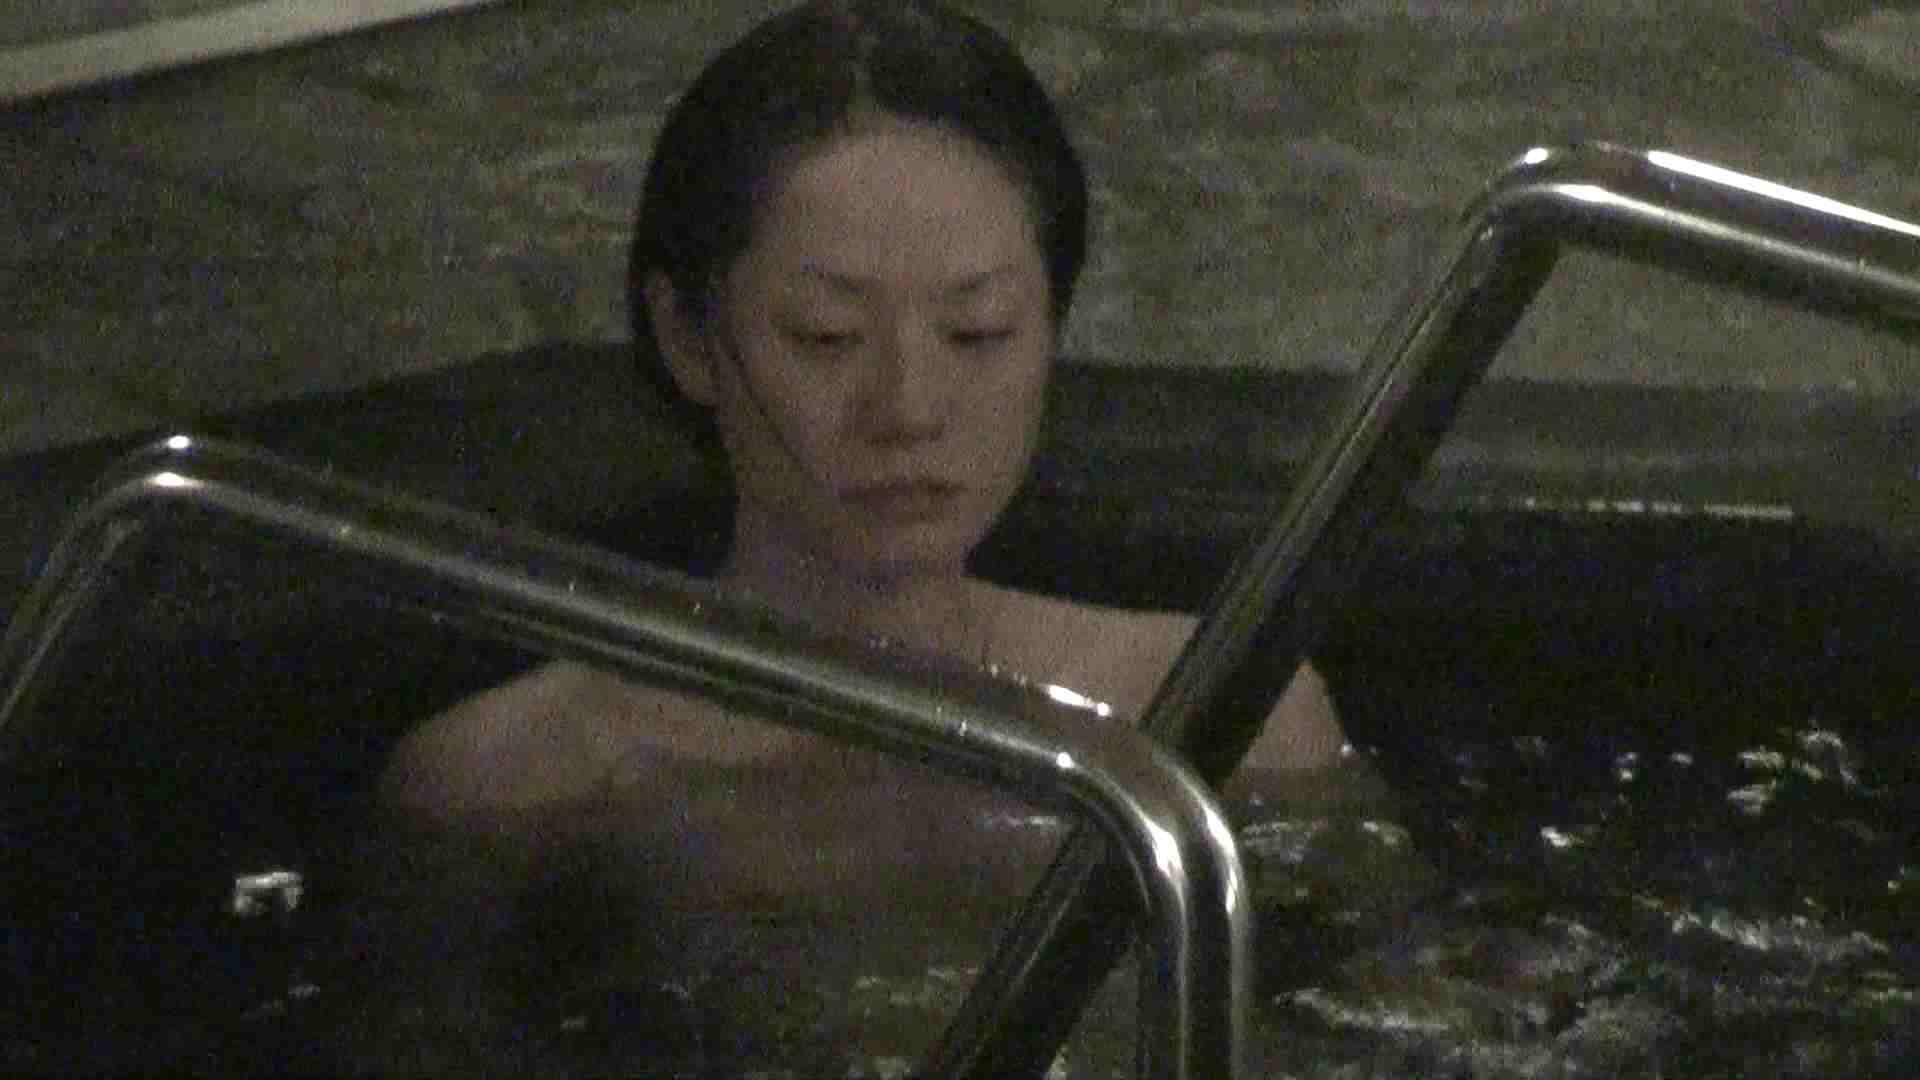 Aquaな露天風呂Vol.318 露天風呂編 | 盗撮シリーズ  109PIX 101